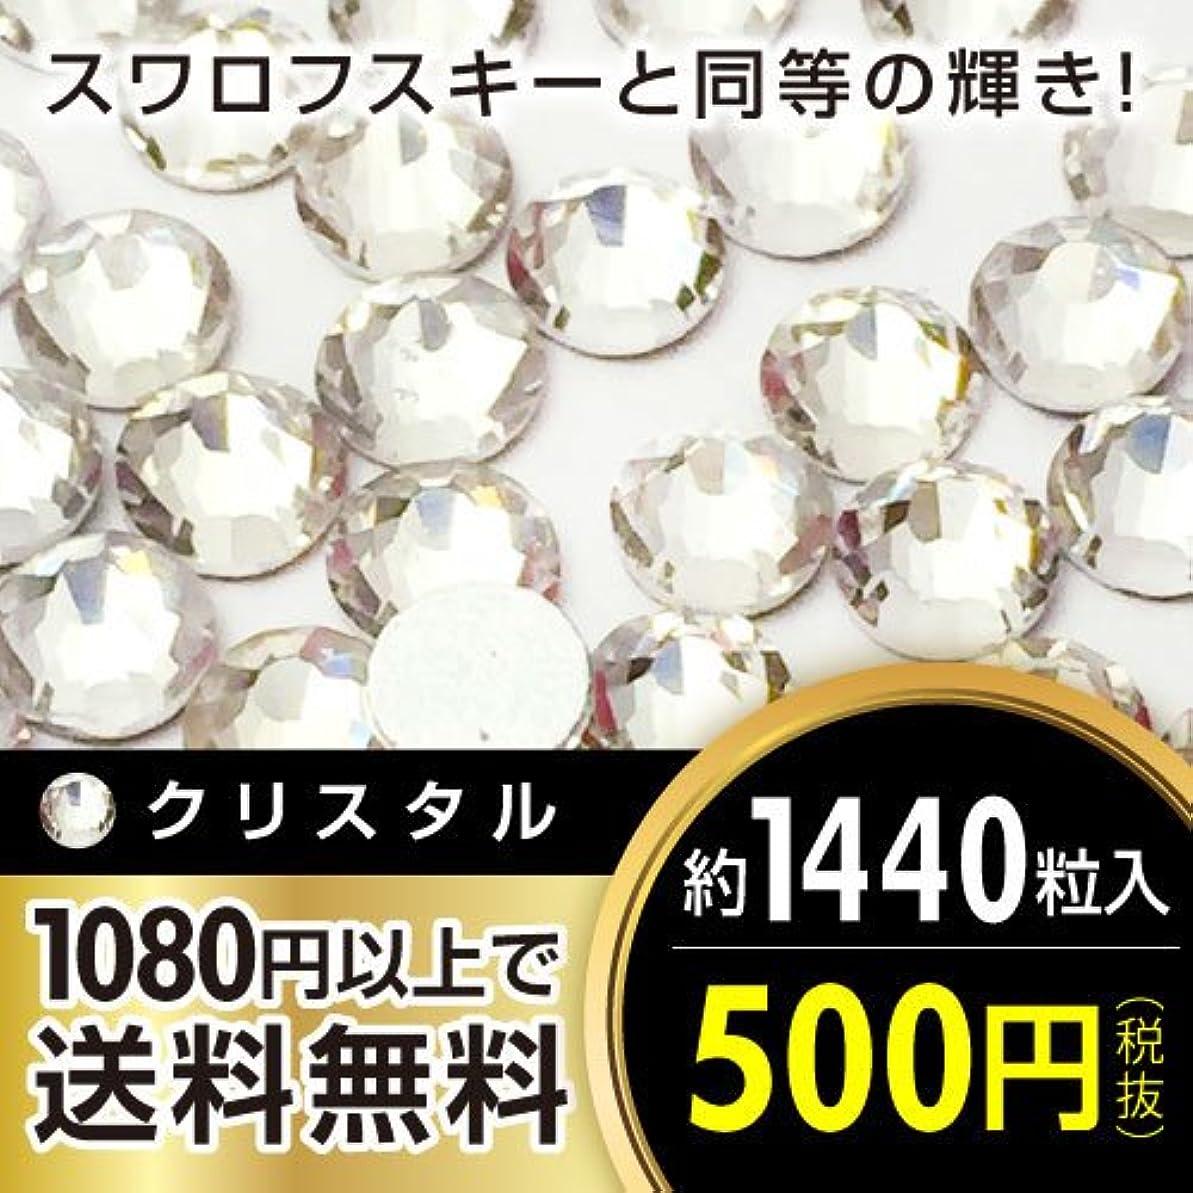 S級 ガラス製ラインストーン SS3~SS16 クリスタルスワロフスキー同等 (SS12(3.0mm) 約1440粒)